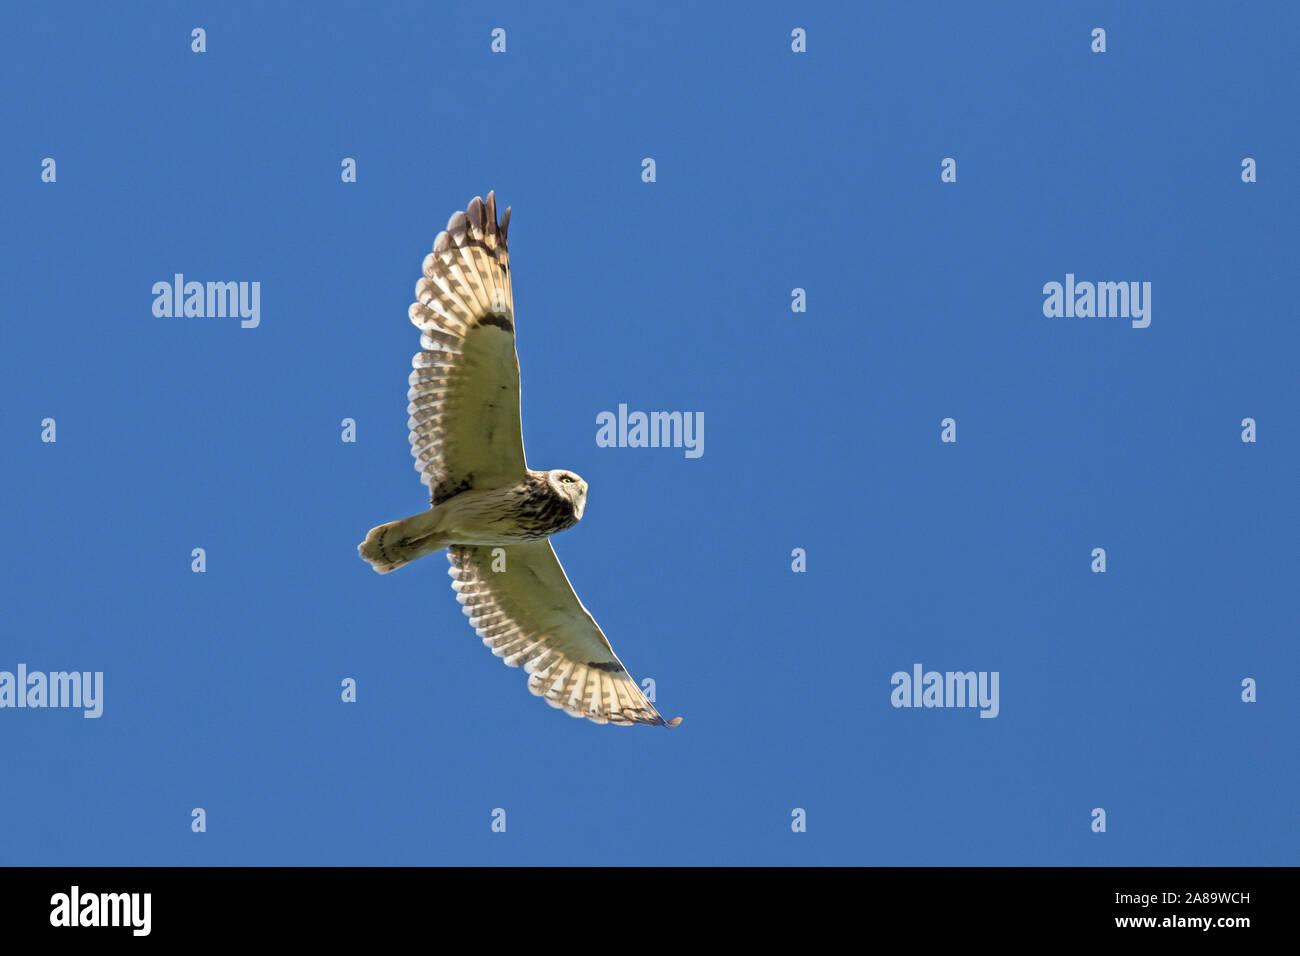 Sumpfohreule (Asio flammeus/Asio accipitrinus) im Flug gegen den blauen Himmel Stockfoto